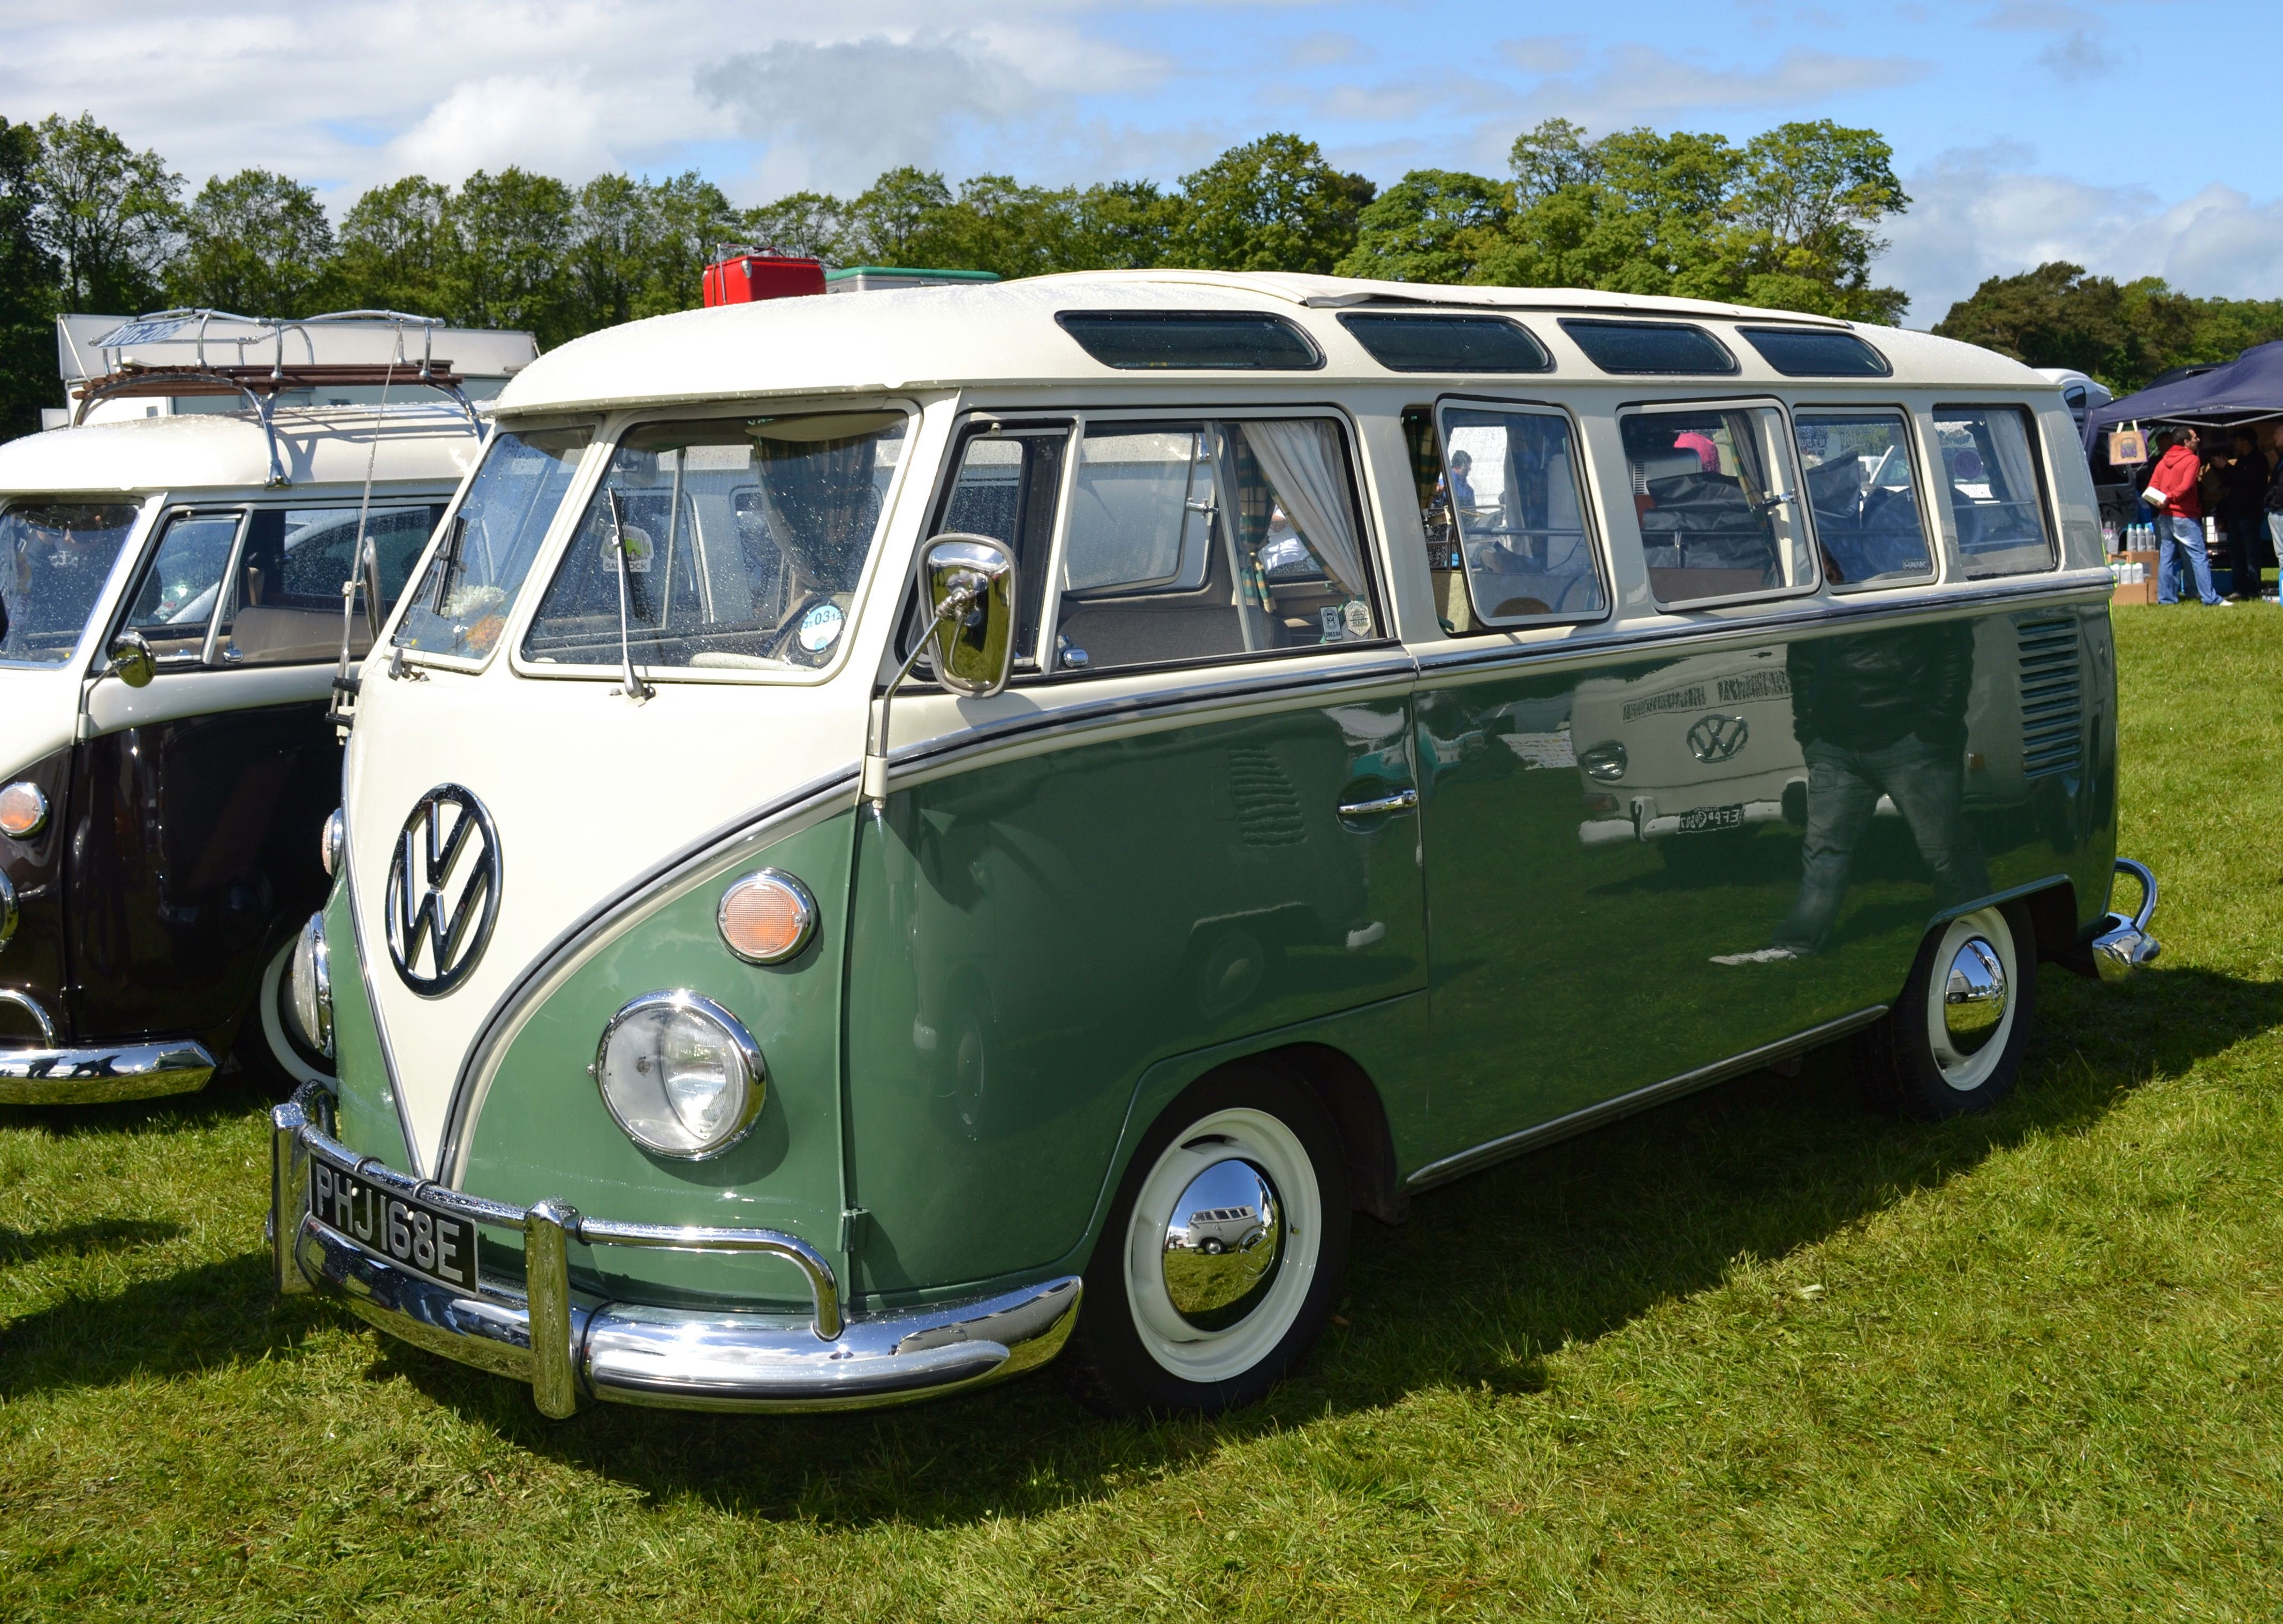 Pictures of 60 vw vans 60 years of the vw camper van part 1